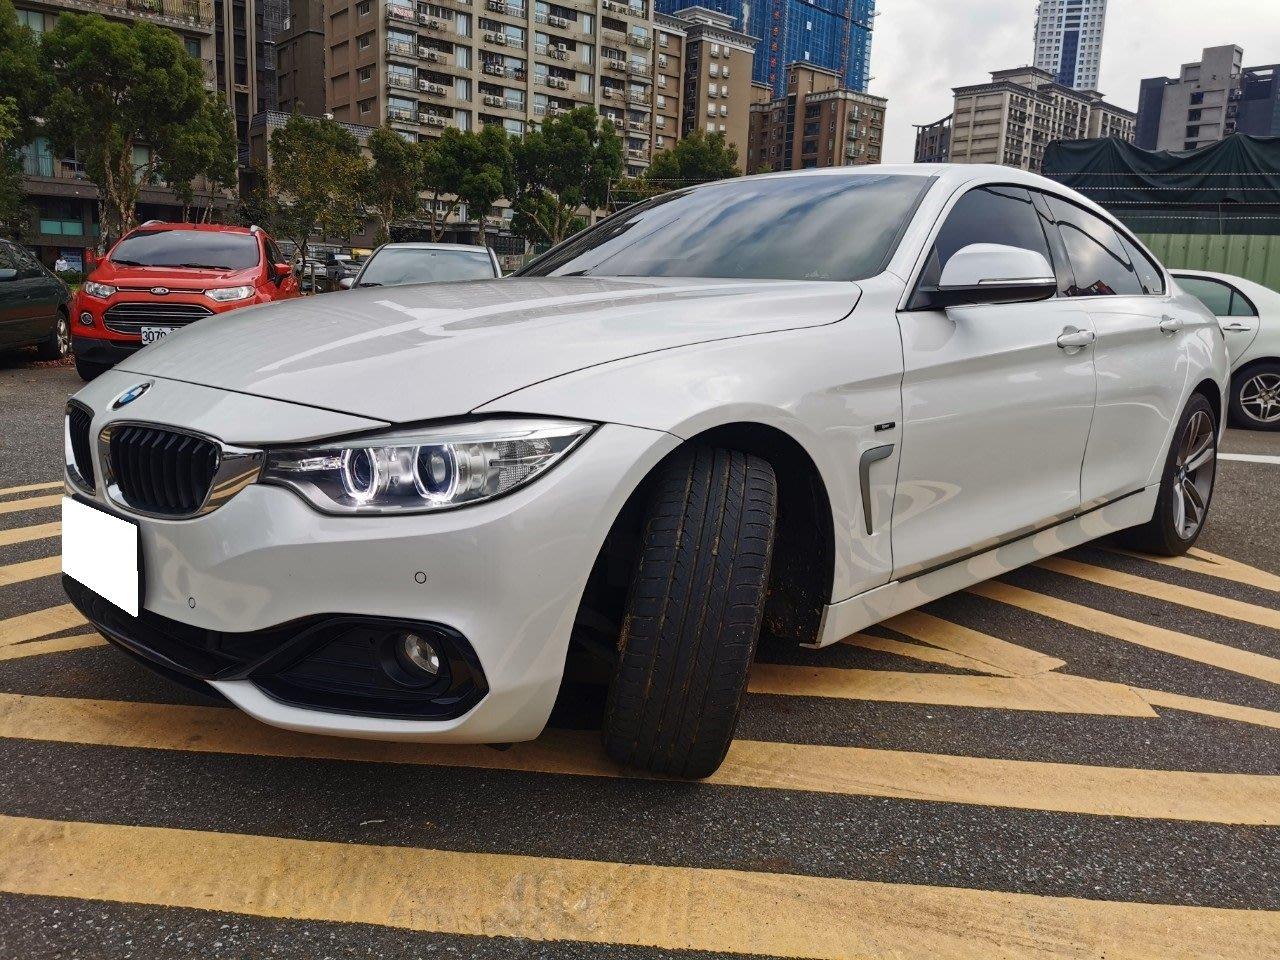 2015 BMW 寶馬 4-series gran coupe